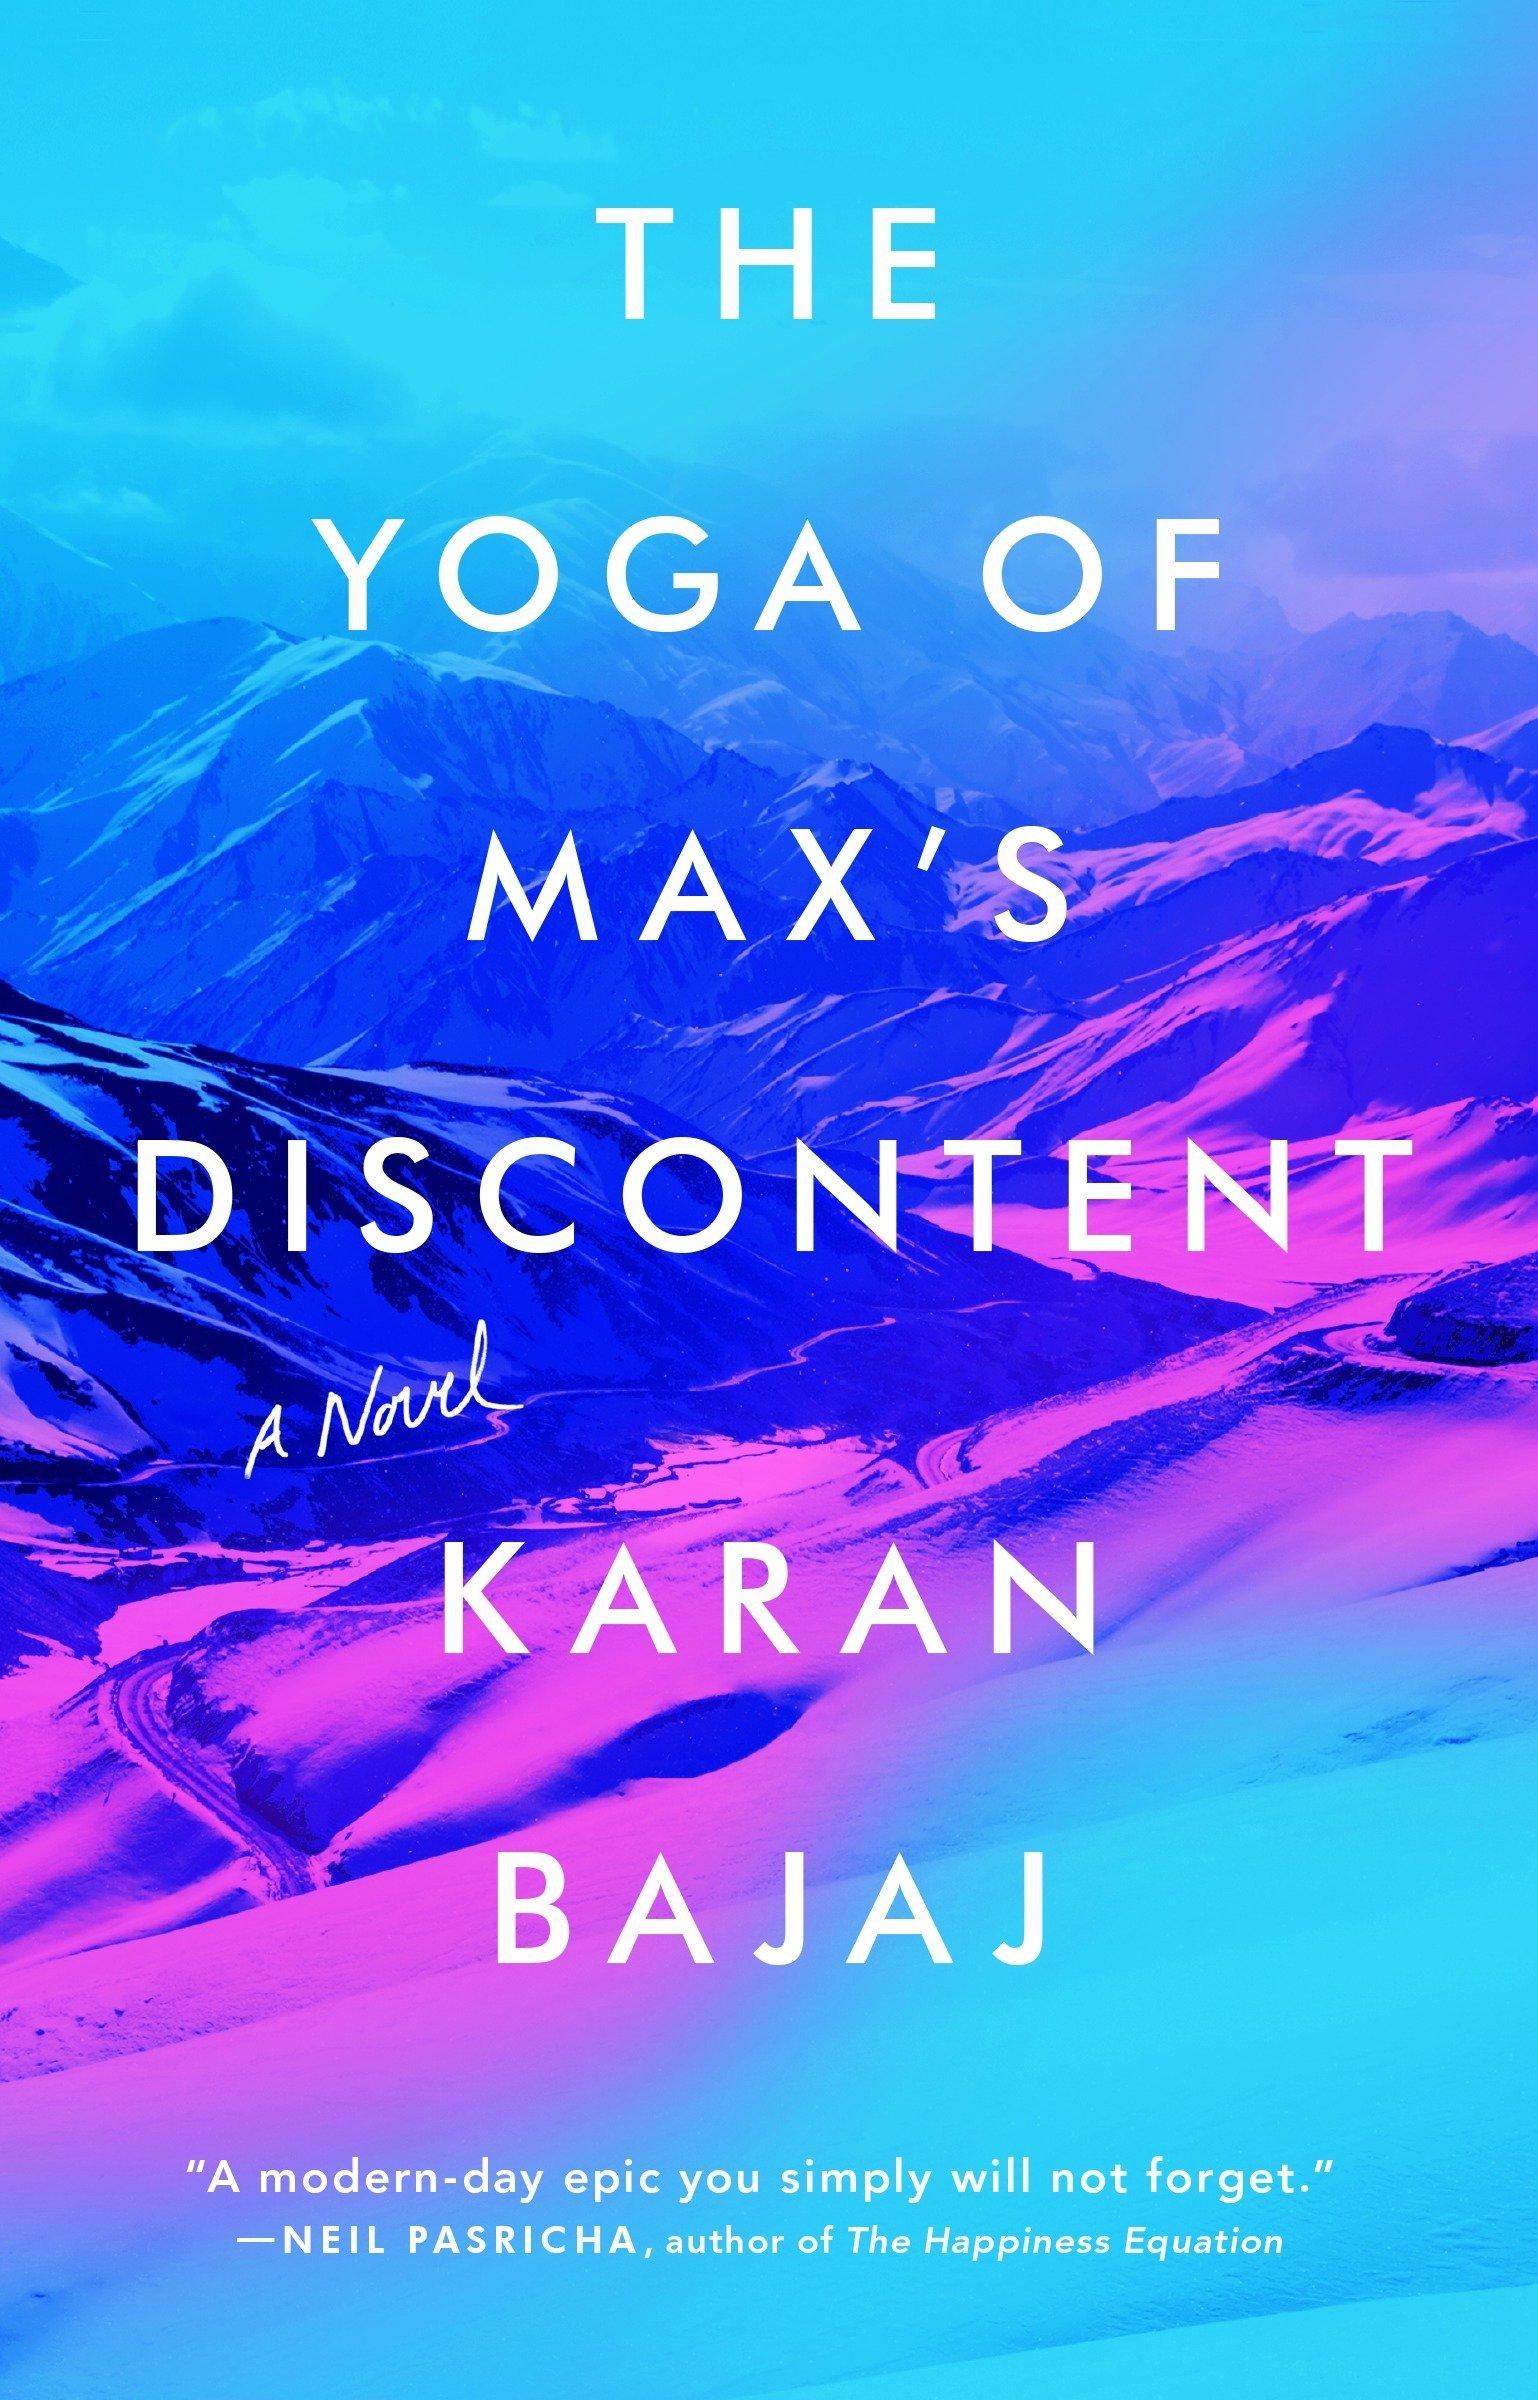 Amazon.com: The Yoga of Max's Discontent: A Novel (9780735213456): Karan  Bajaj: Books